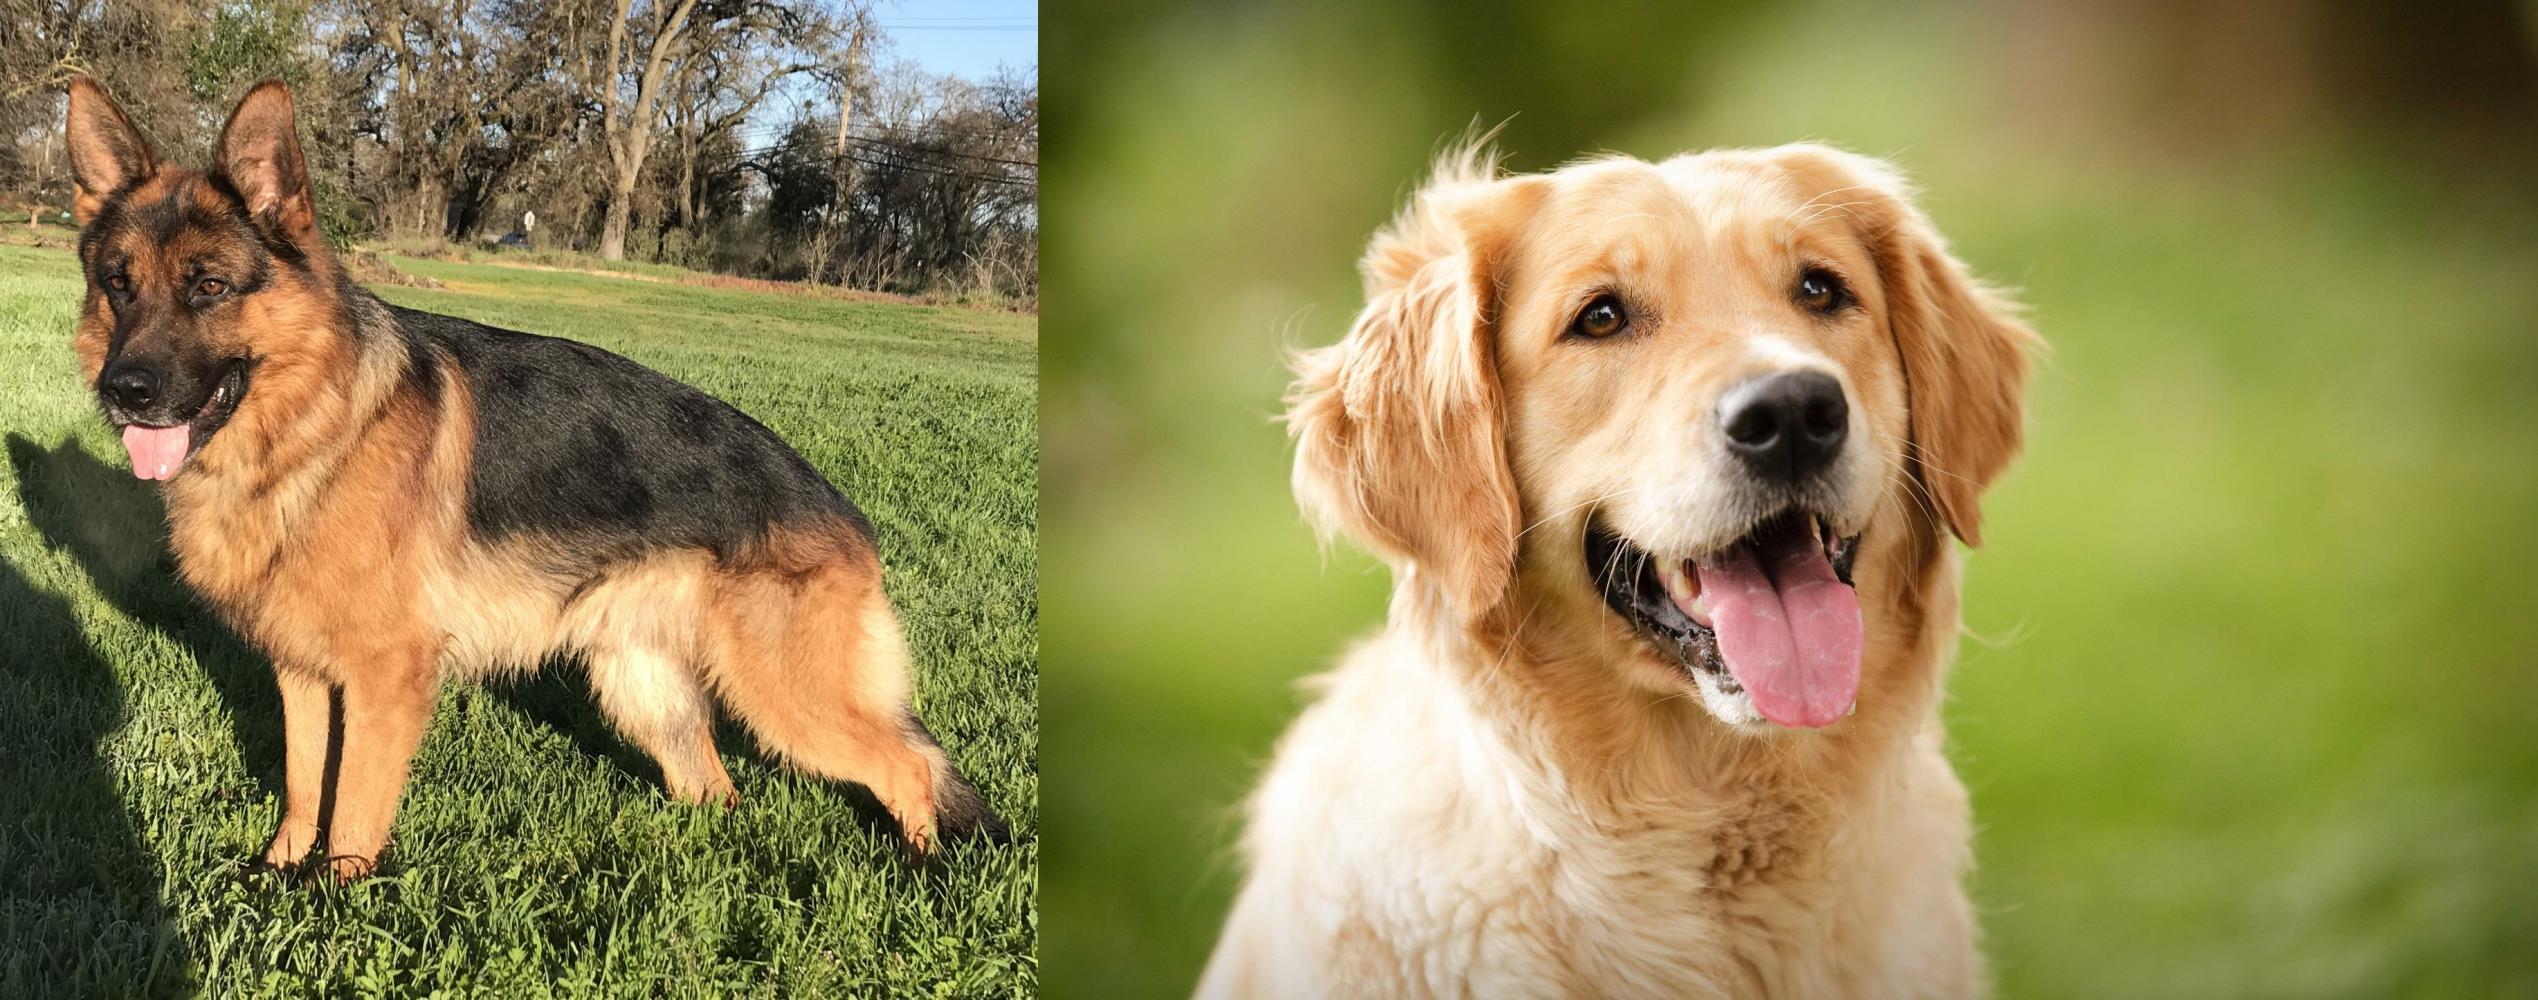 Golden Retriever Vs German Shepherd Breed Comparison Mydogbreeds